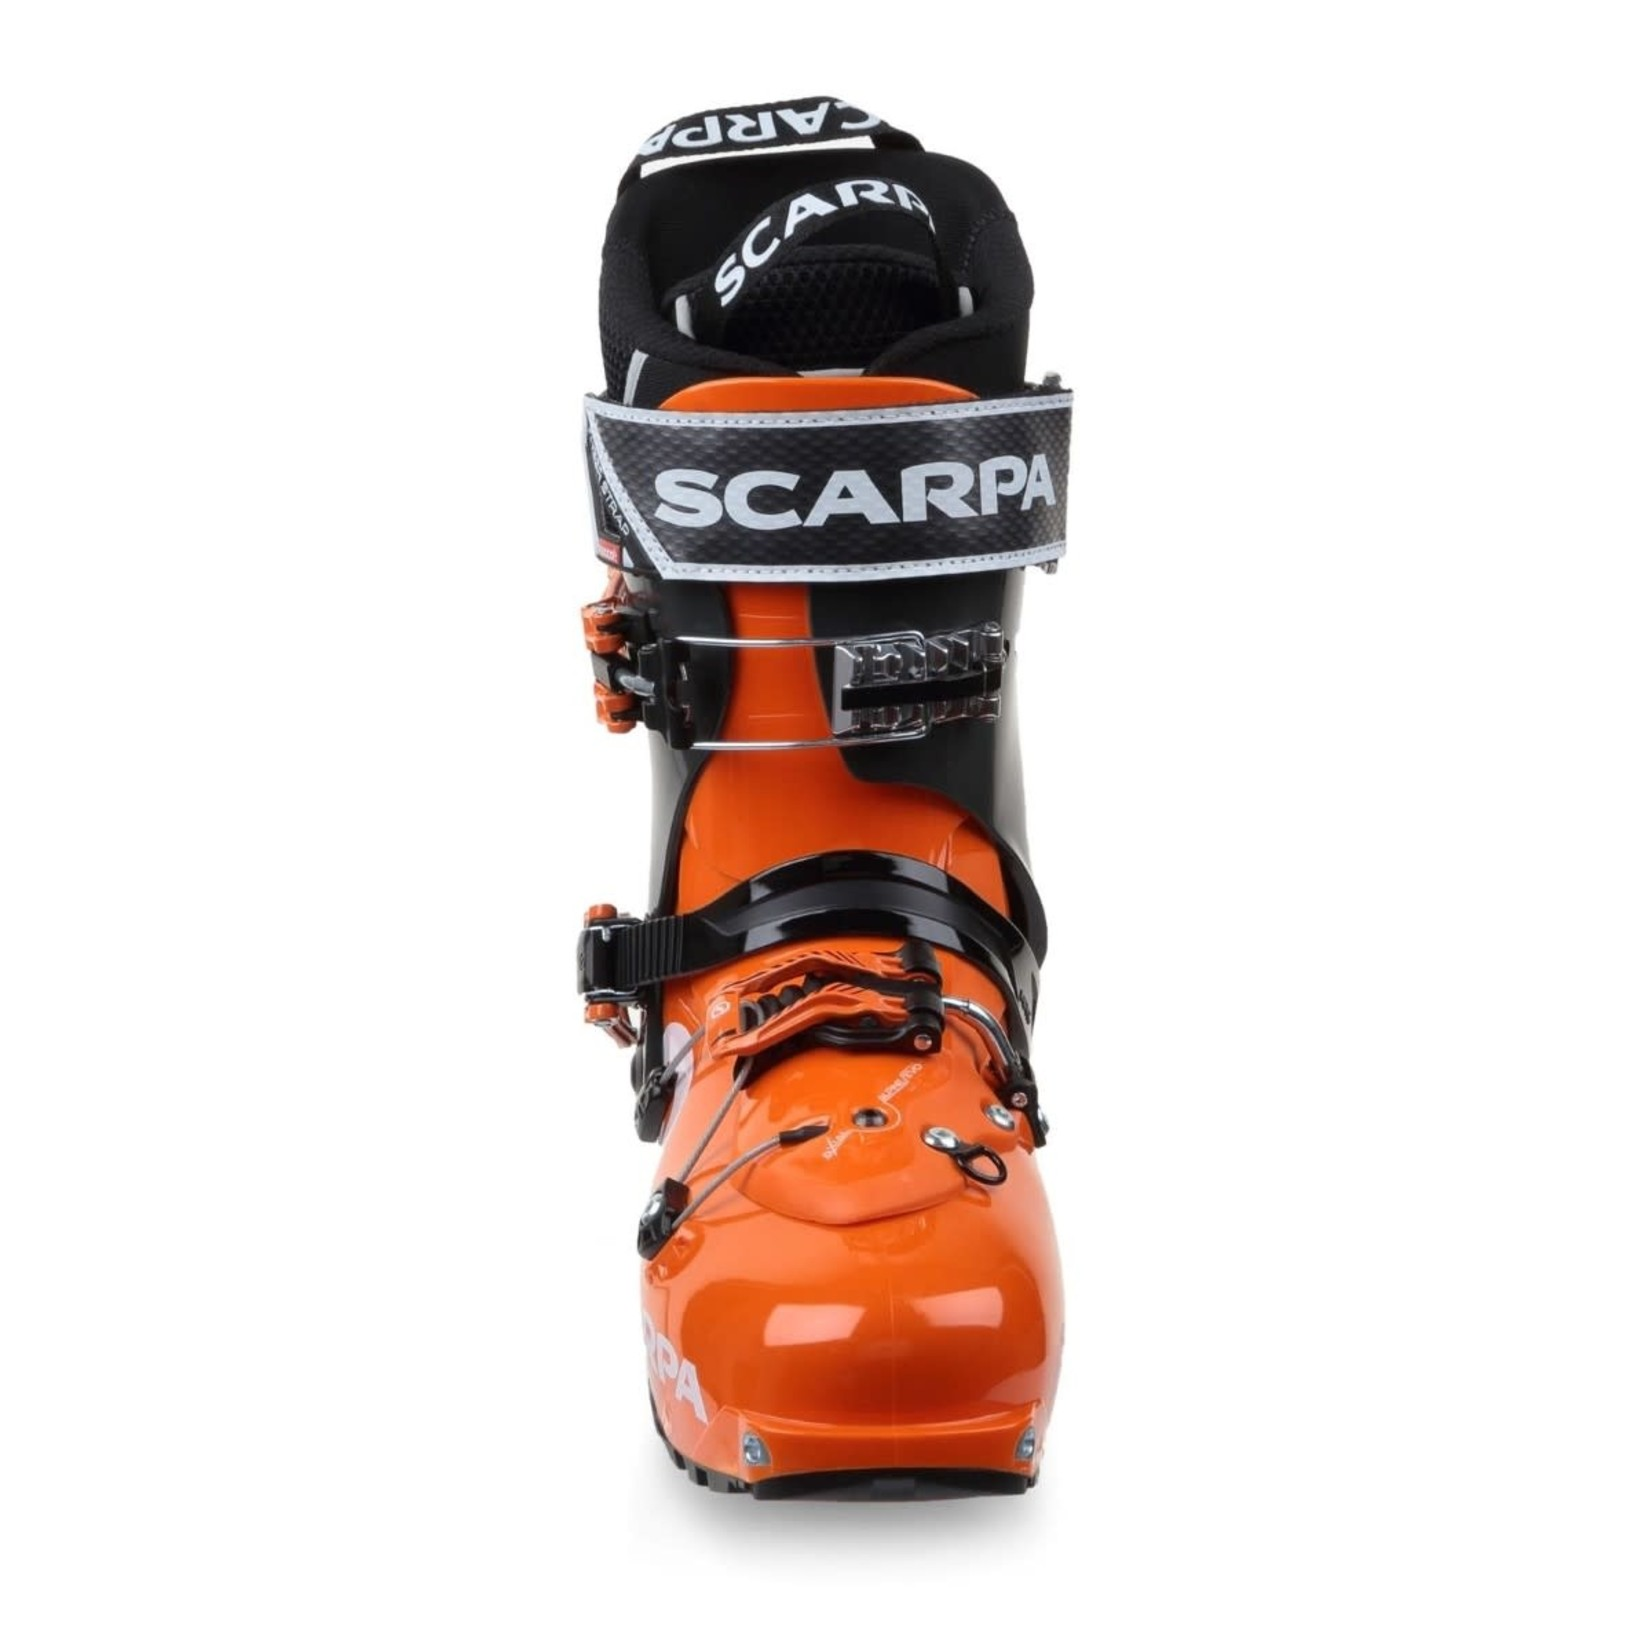 Scarpa Scarpa Maestrale Ski Boots - Men